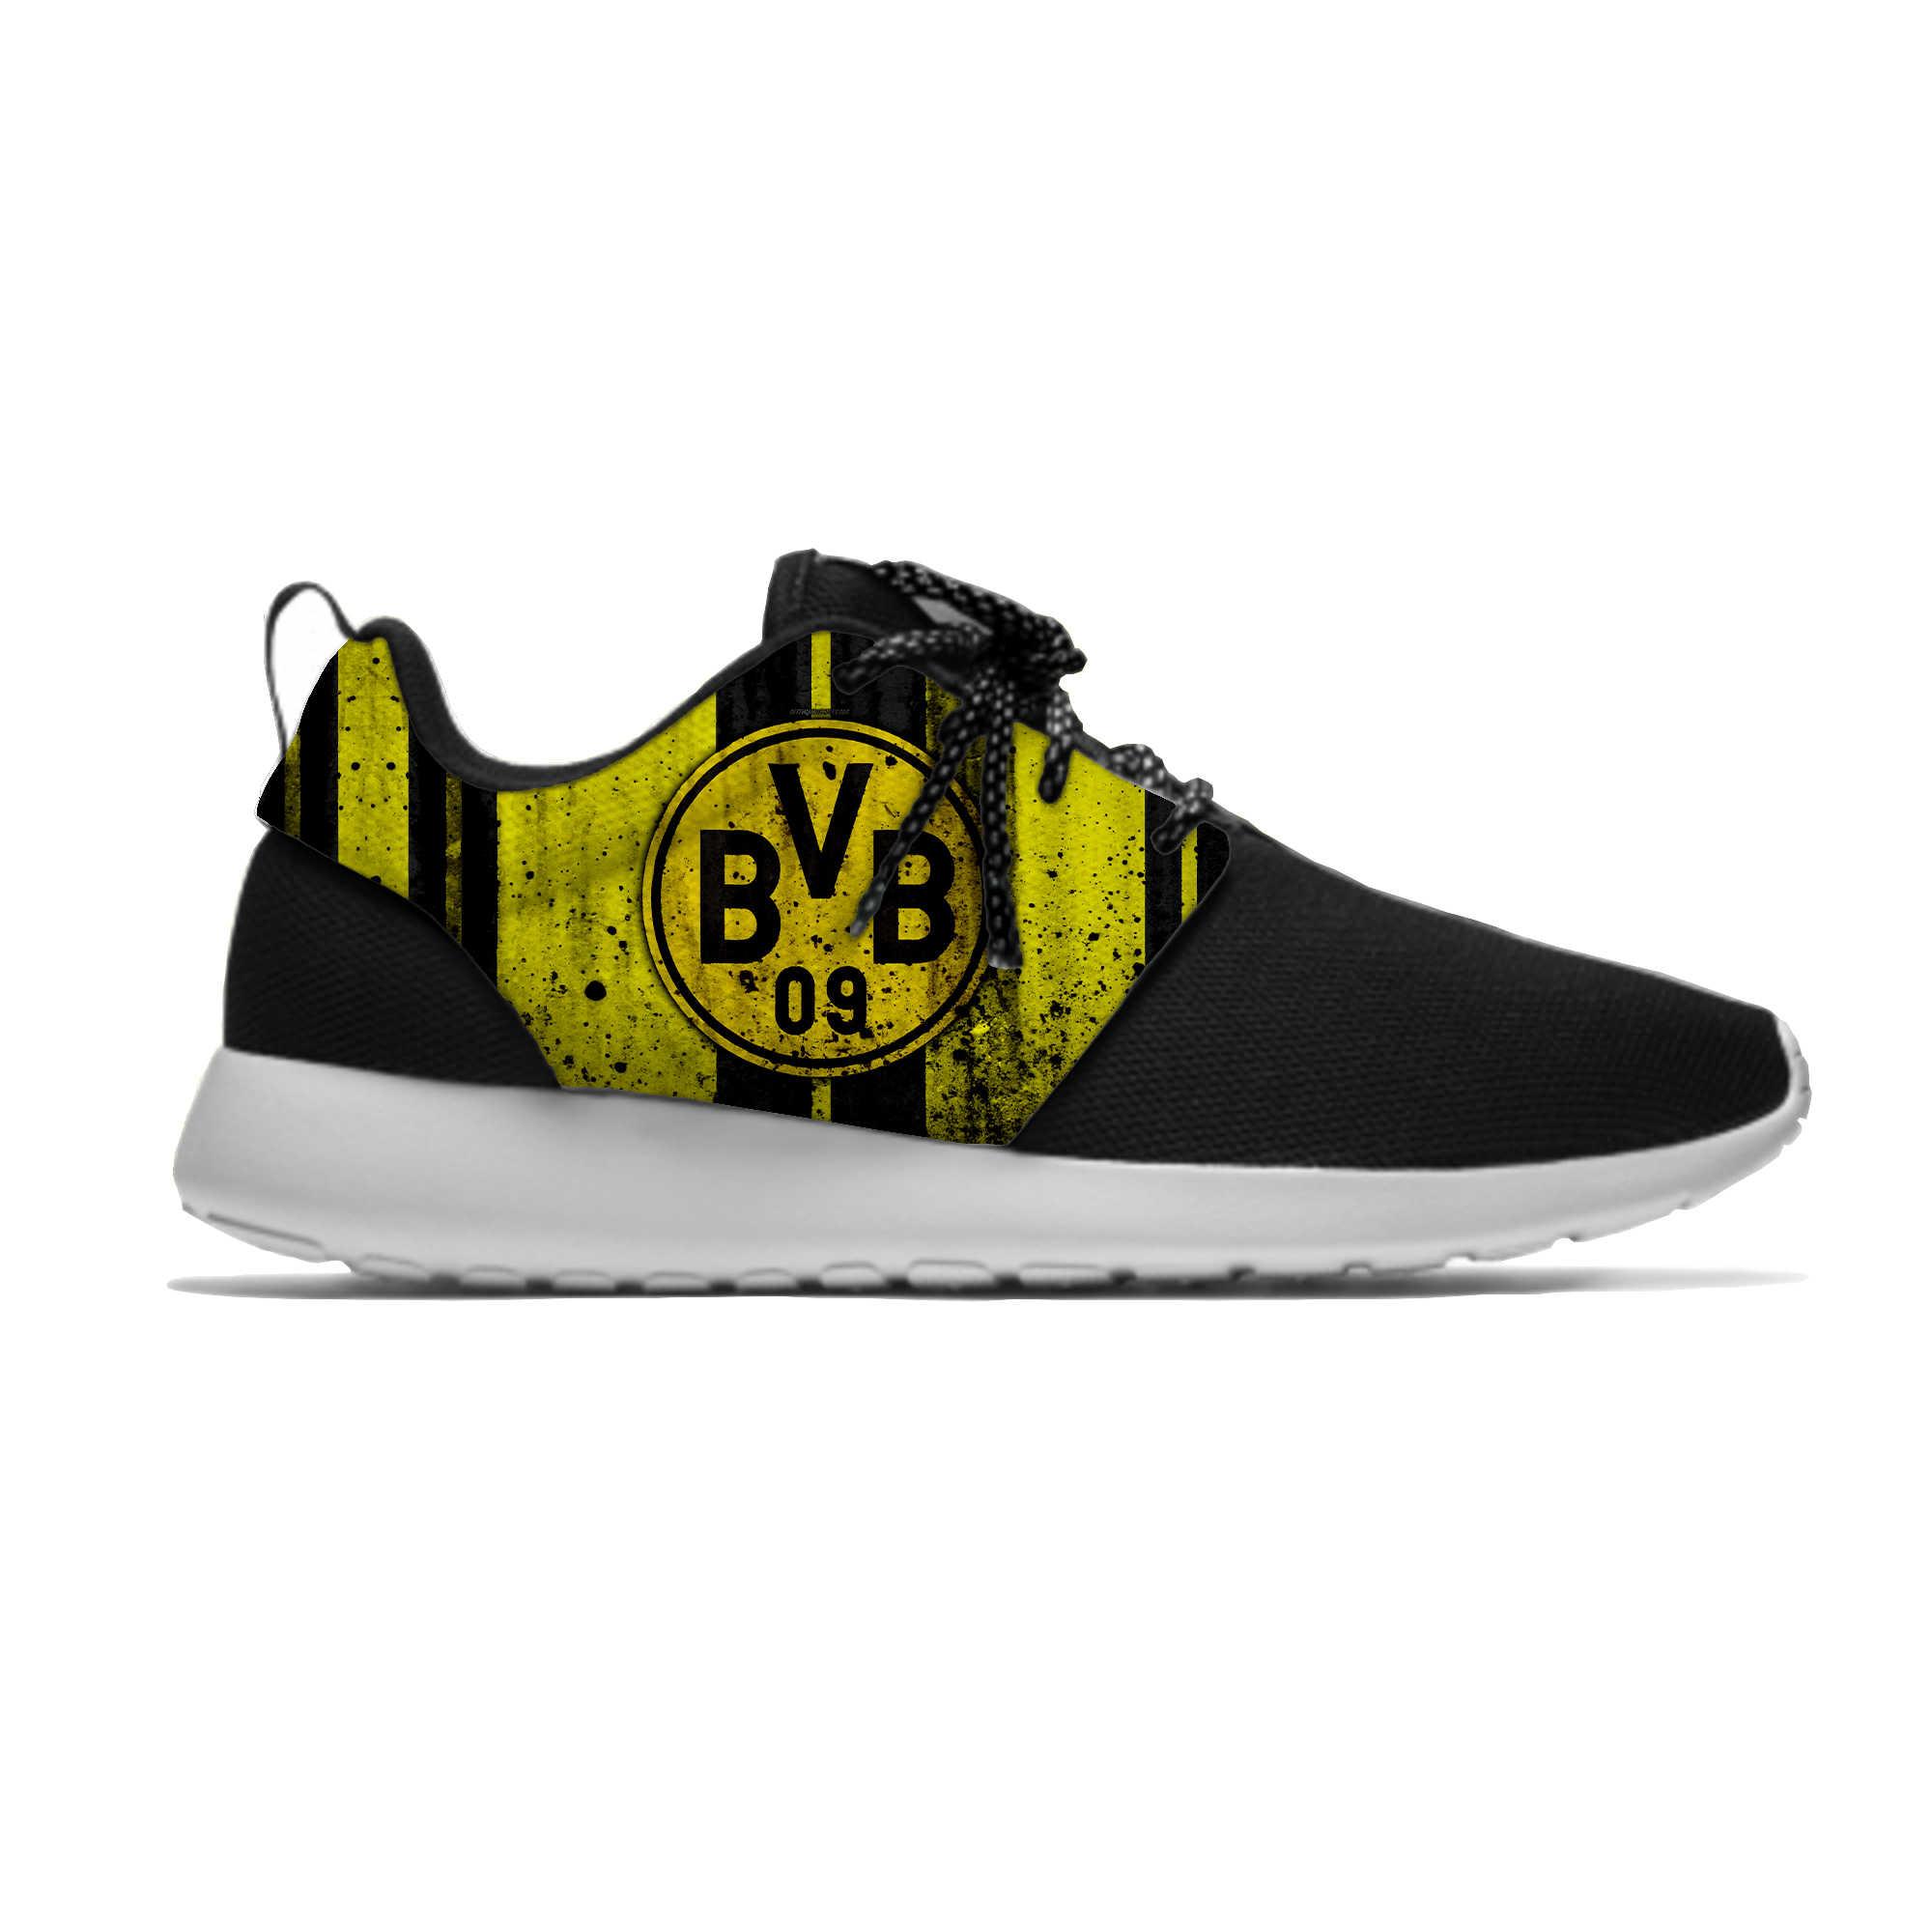 Dortmund Sepatu Olahraga Klub Sepak Bola FC Penggemar Sepak Bola Ringan Borussia Sejuk Santai Pria/Wanita Running Meshy Sepatu